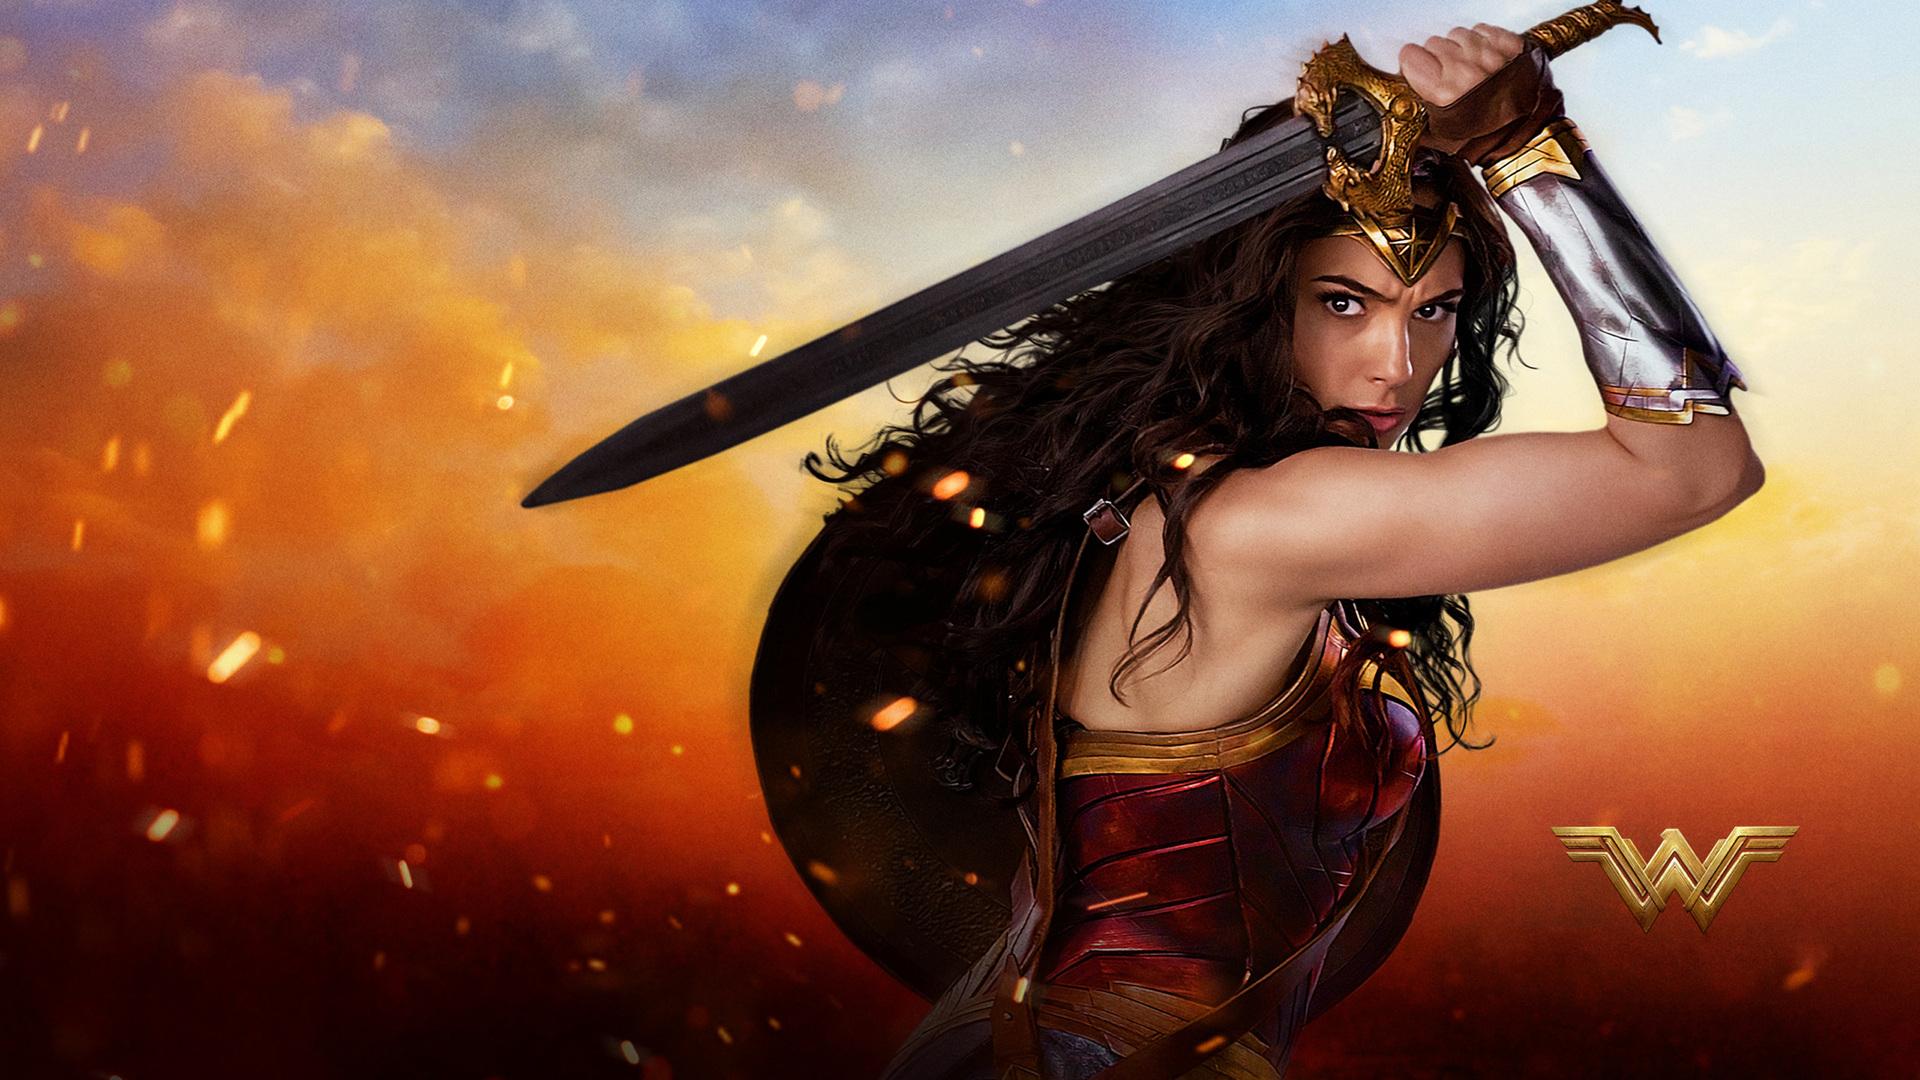 Wonder Woman 2017 Wallpaper Full Hd Free Download: 1920x1080 2017 Wonder Woman HD Laptop Full HD 1080P HD 4k